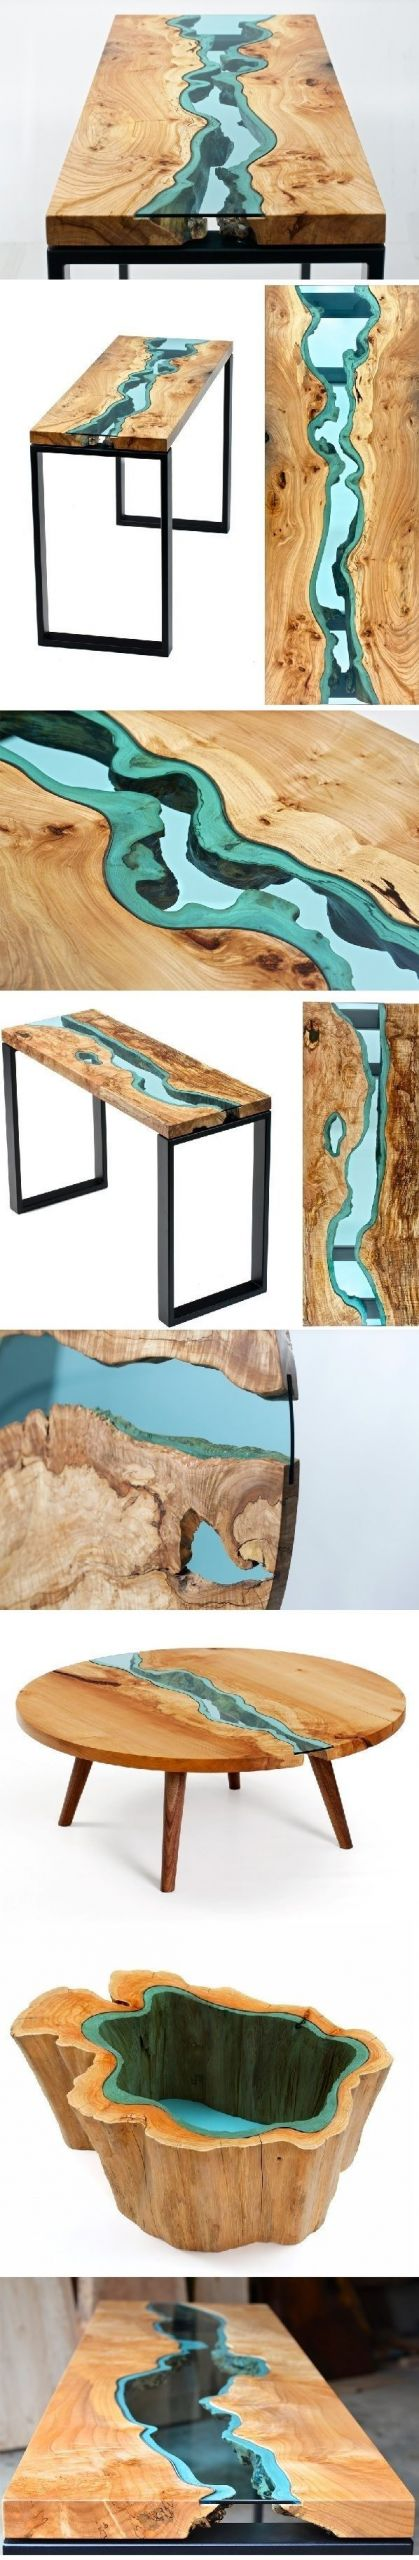 cc4e3848f45db355fc525f80 unique furniture resin wood furniture